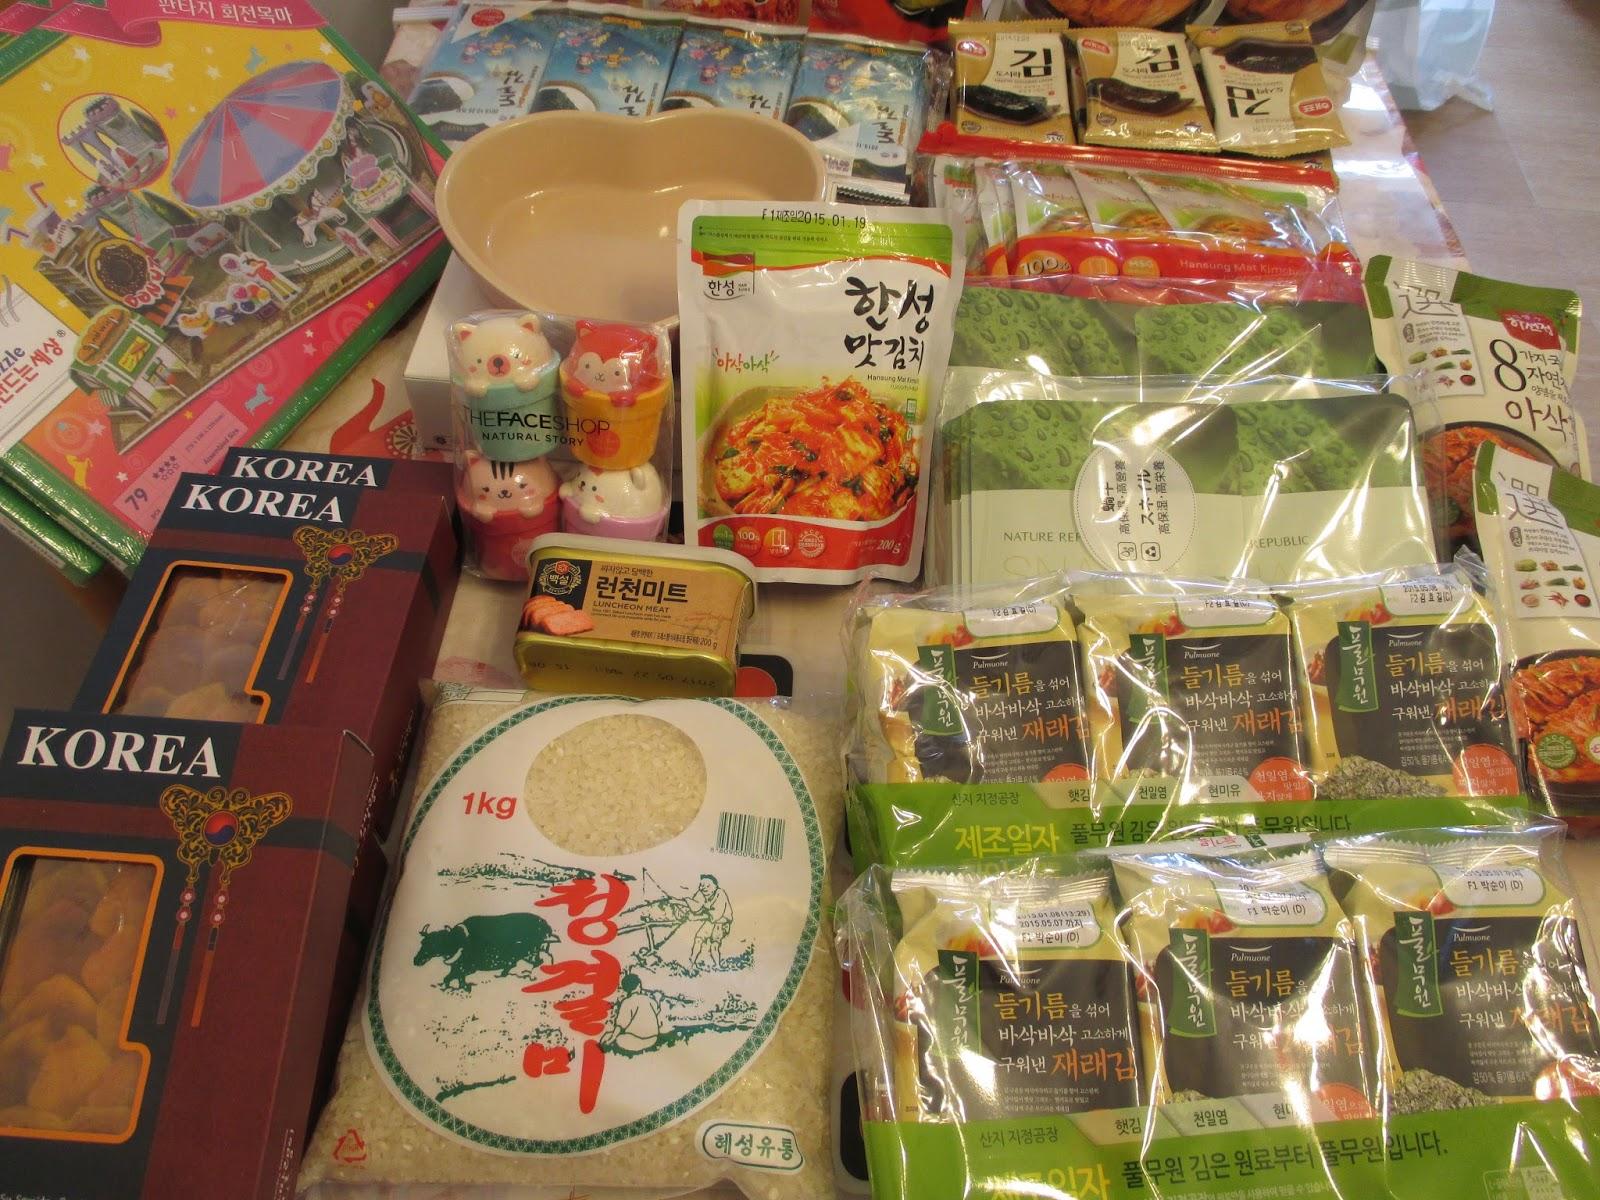 Helen's Kitchen: 韓國五天之旅(19-23.1.2015) - 手信篇